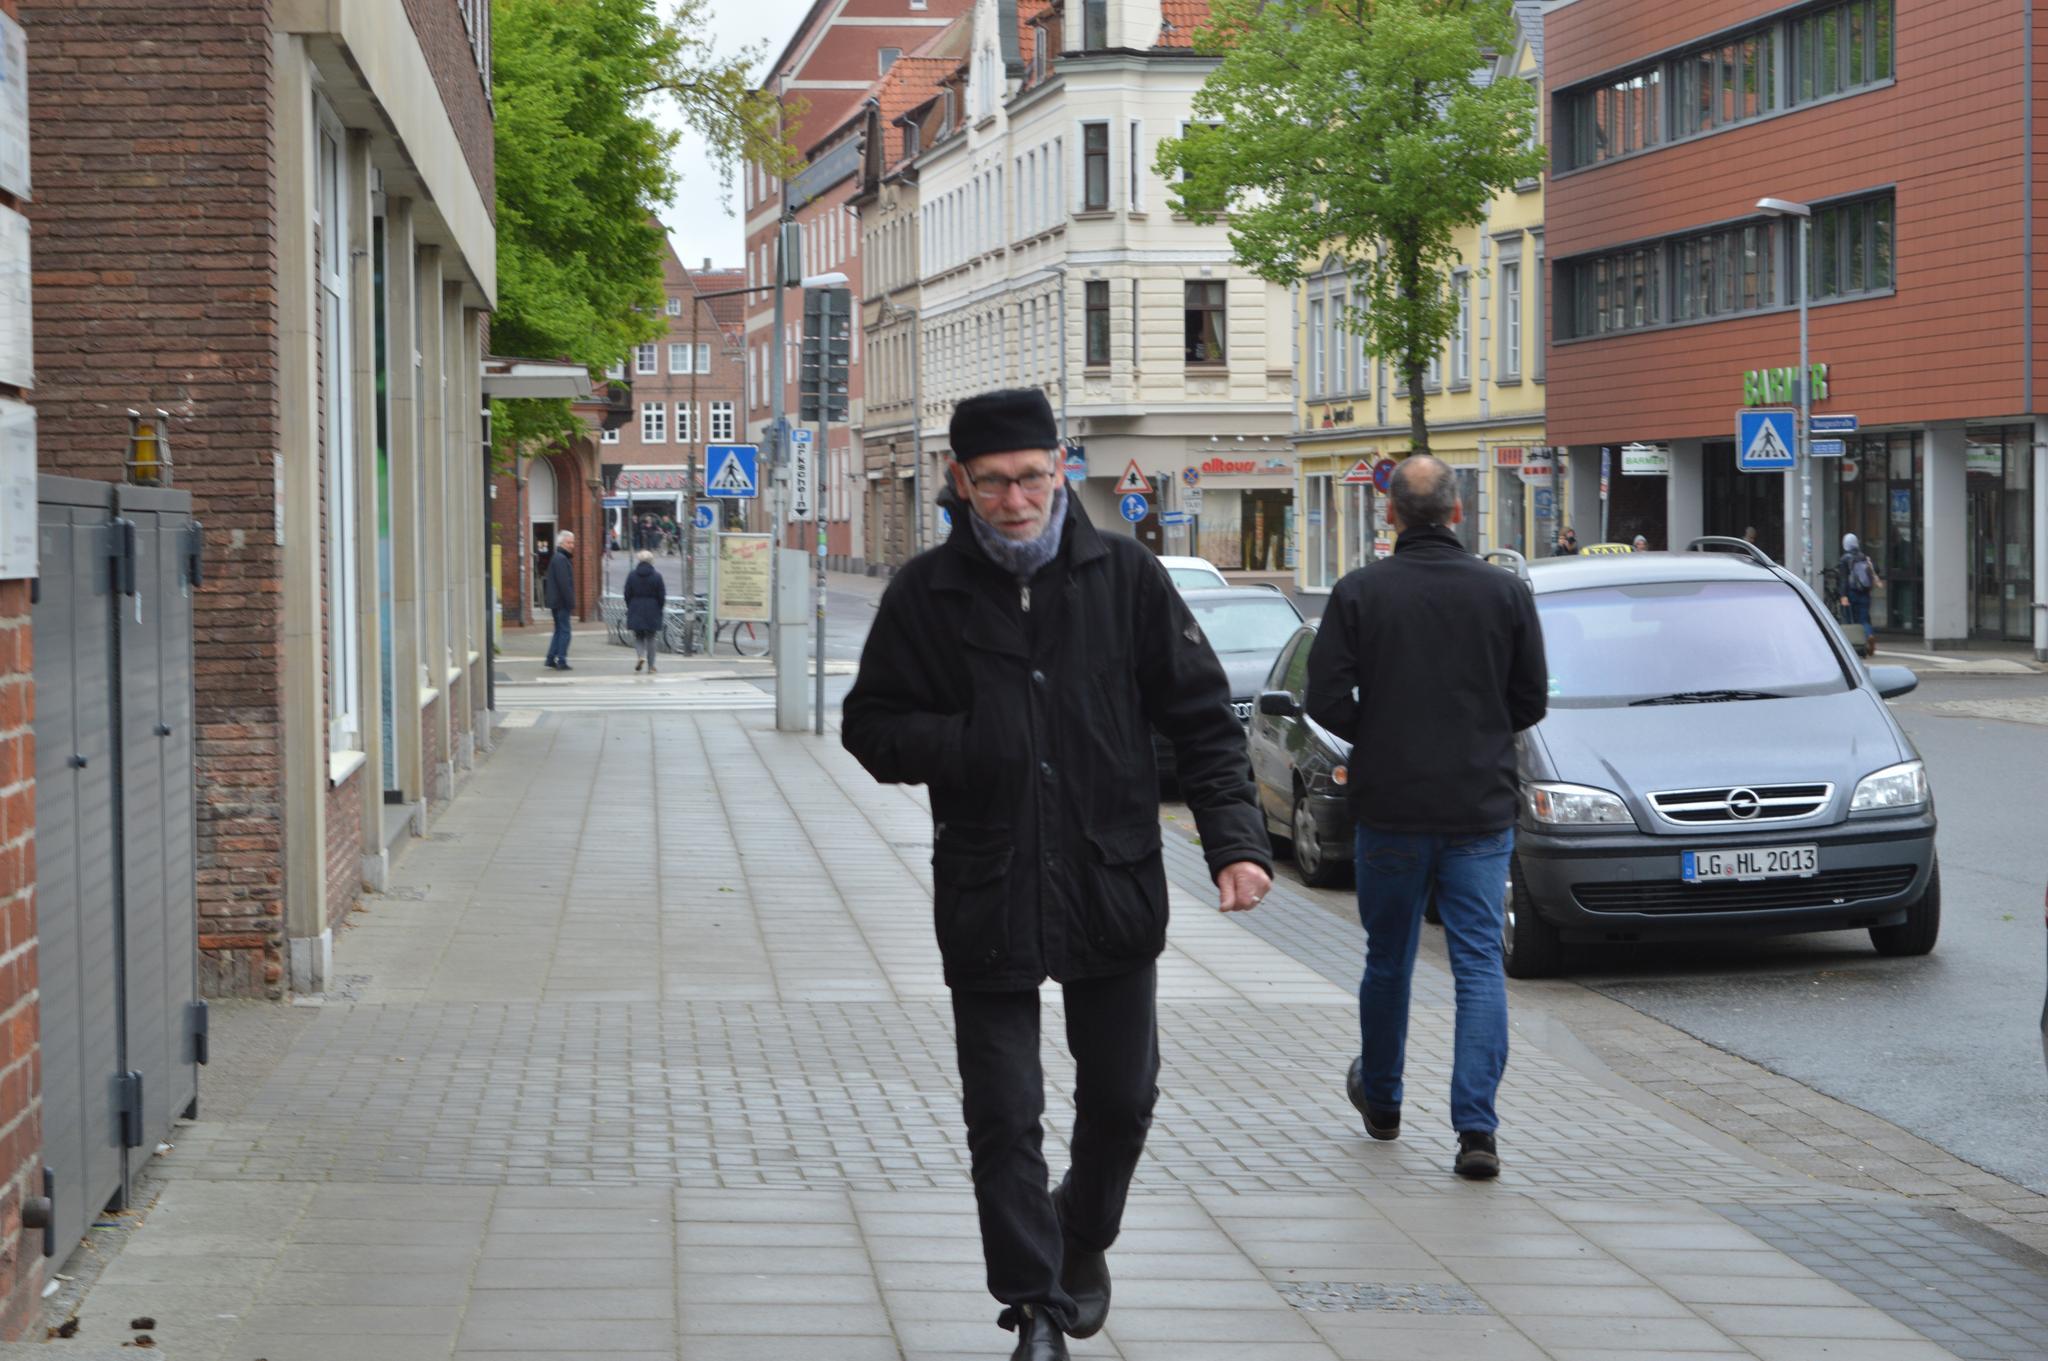 #1.Mai 2018 Lüneburg